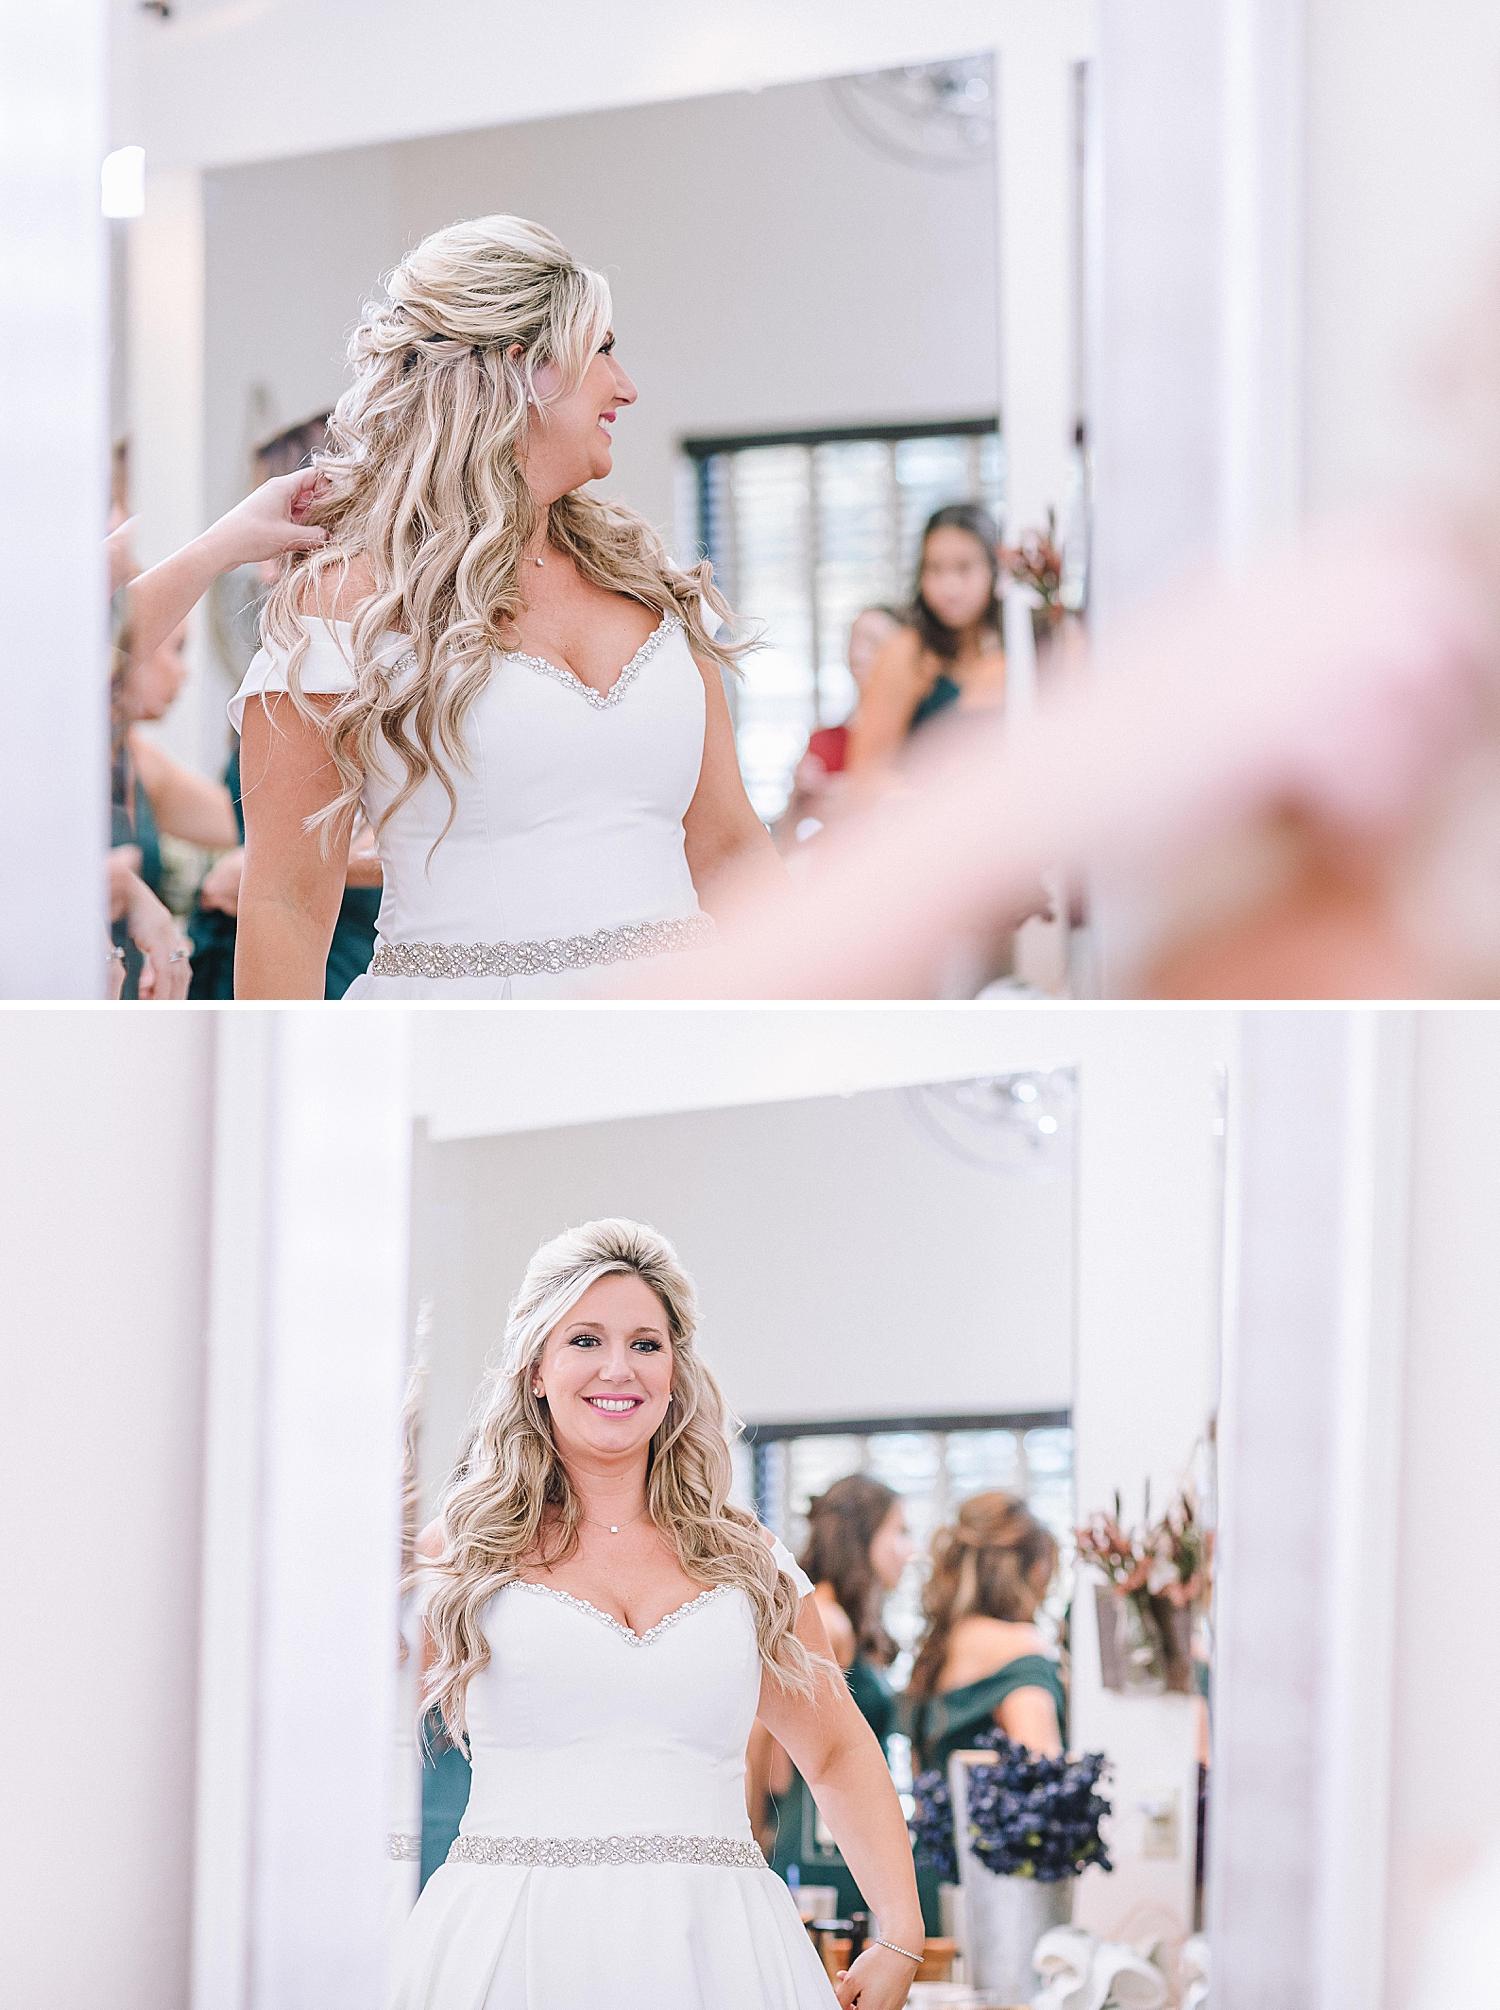 Magnolia-Halle-Wedding-San-Antonio-Texas-Bride-Grom_0023.jpg